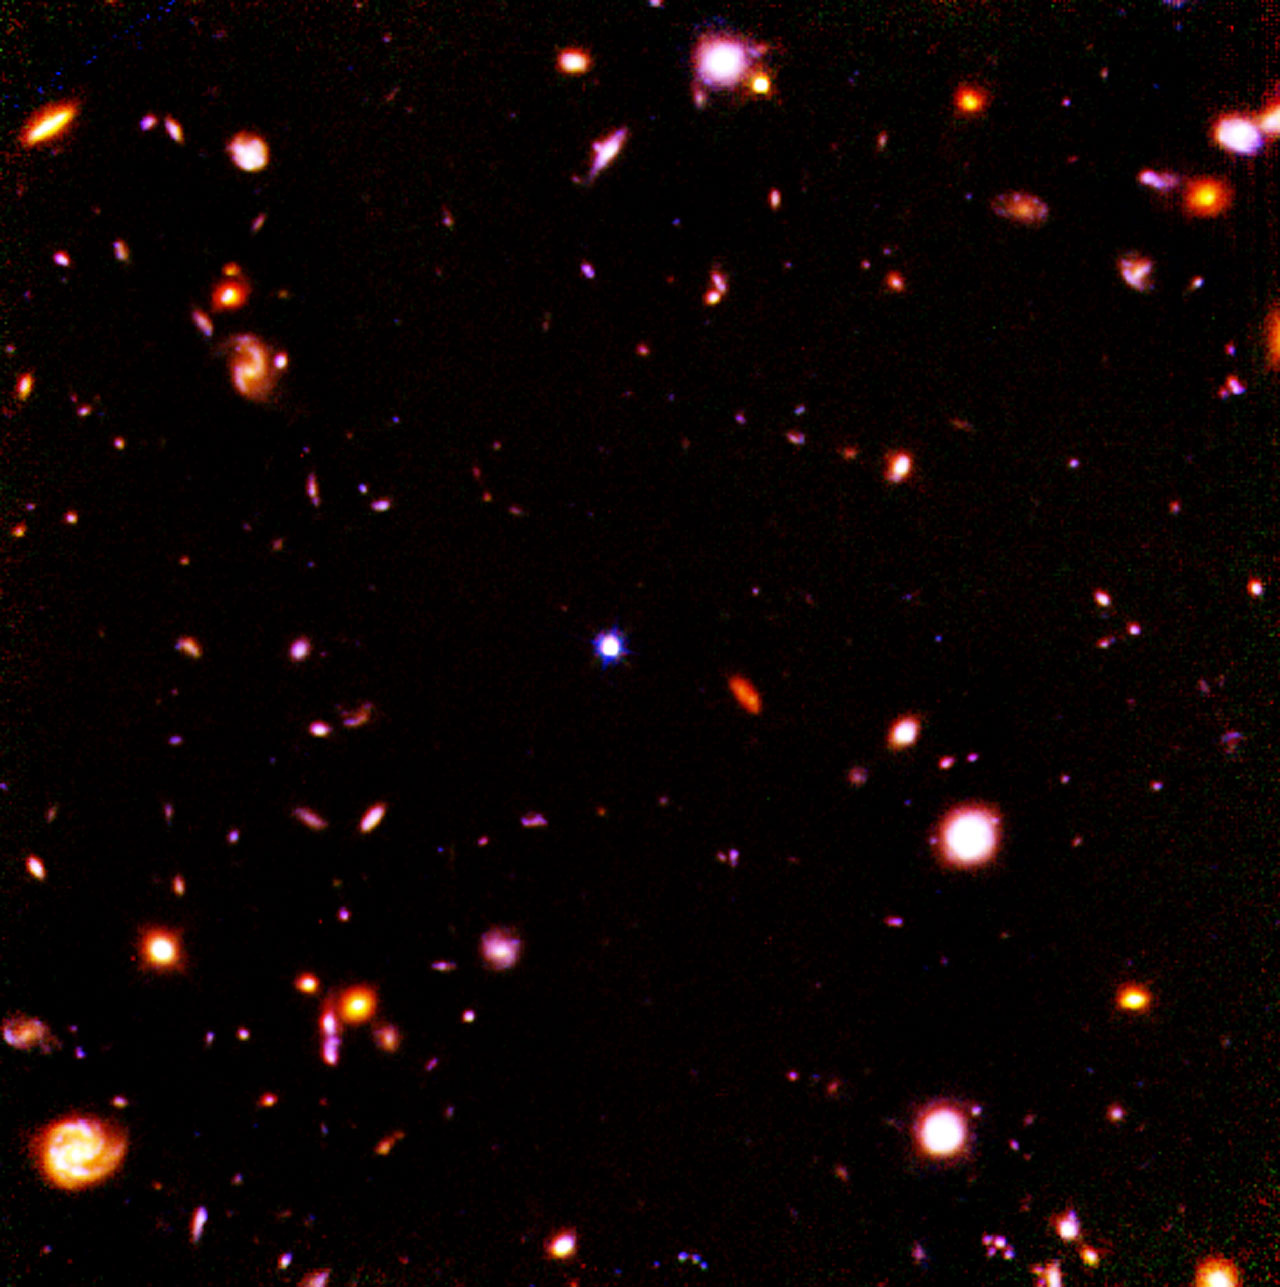 Hubble Deep Field in Infrared